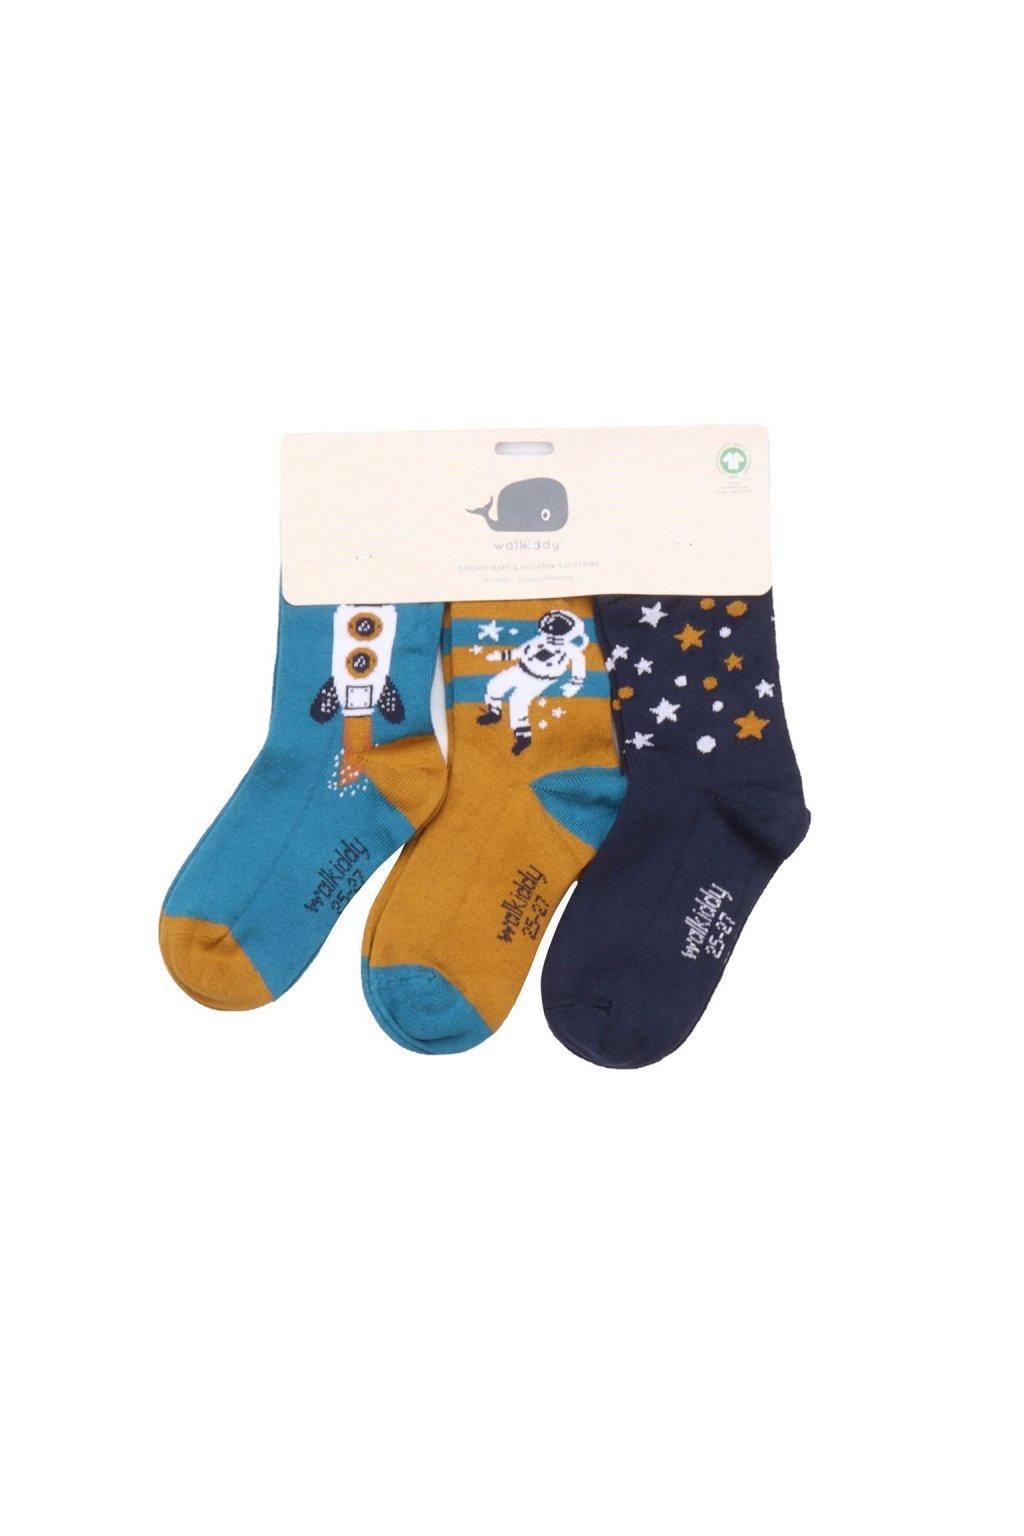 biobavlna gots detske ponozky walkiddy (11)